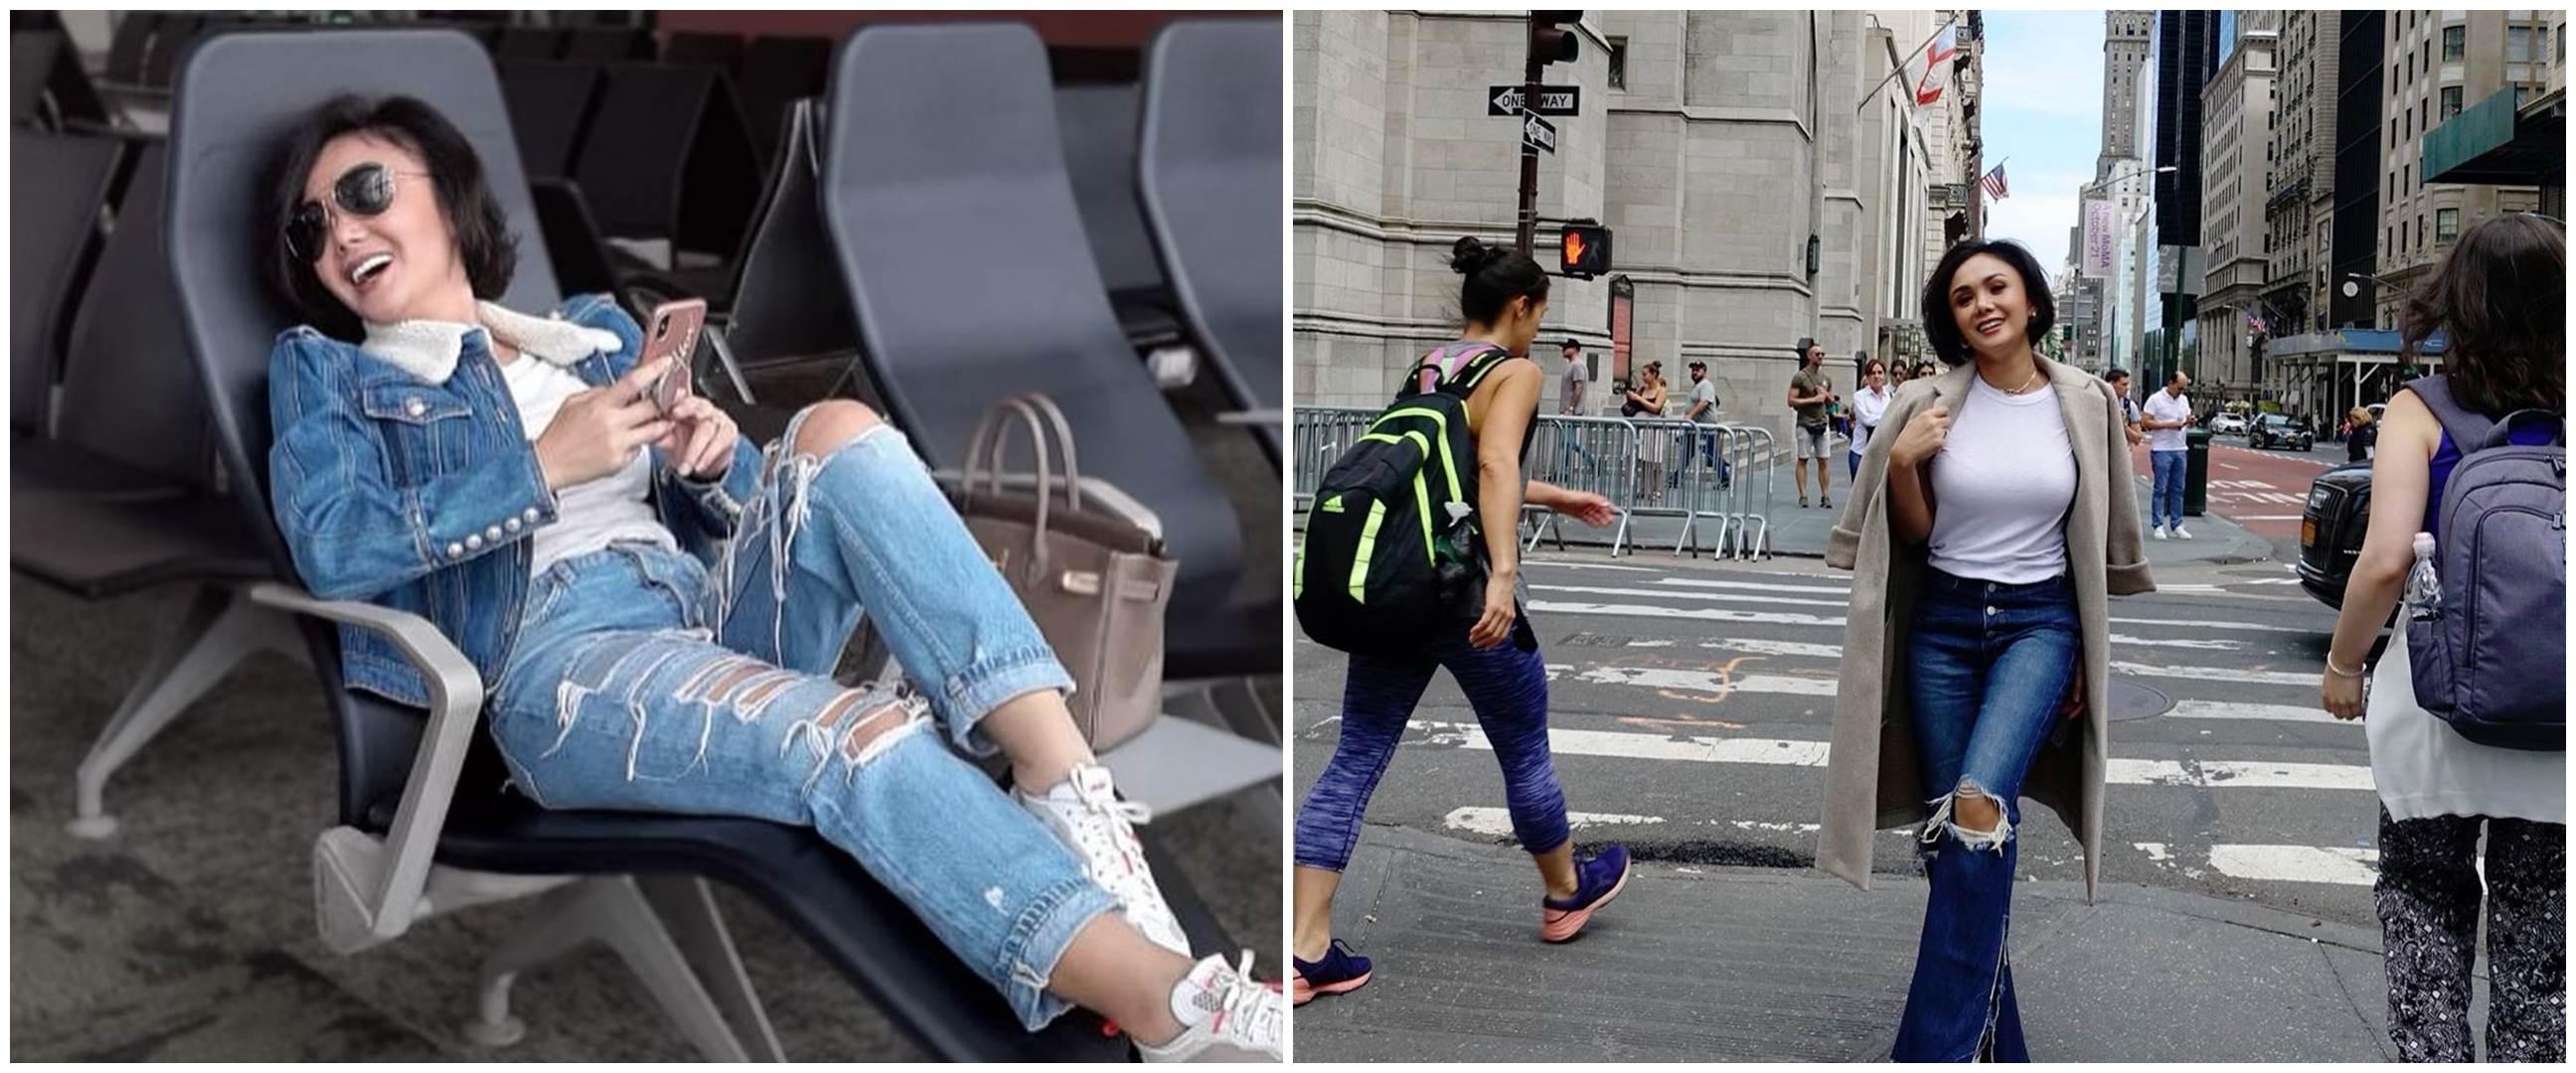 9 Gaya Yuni Shara menggunakan jeans sobek-sobek, bak ABG